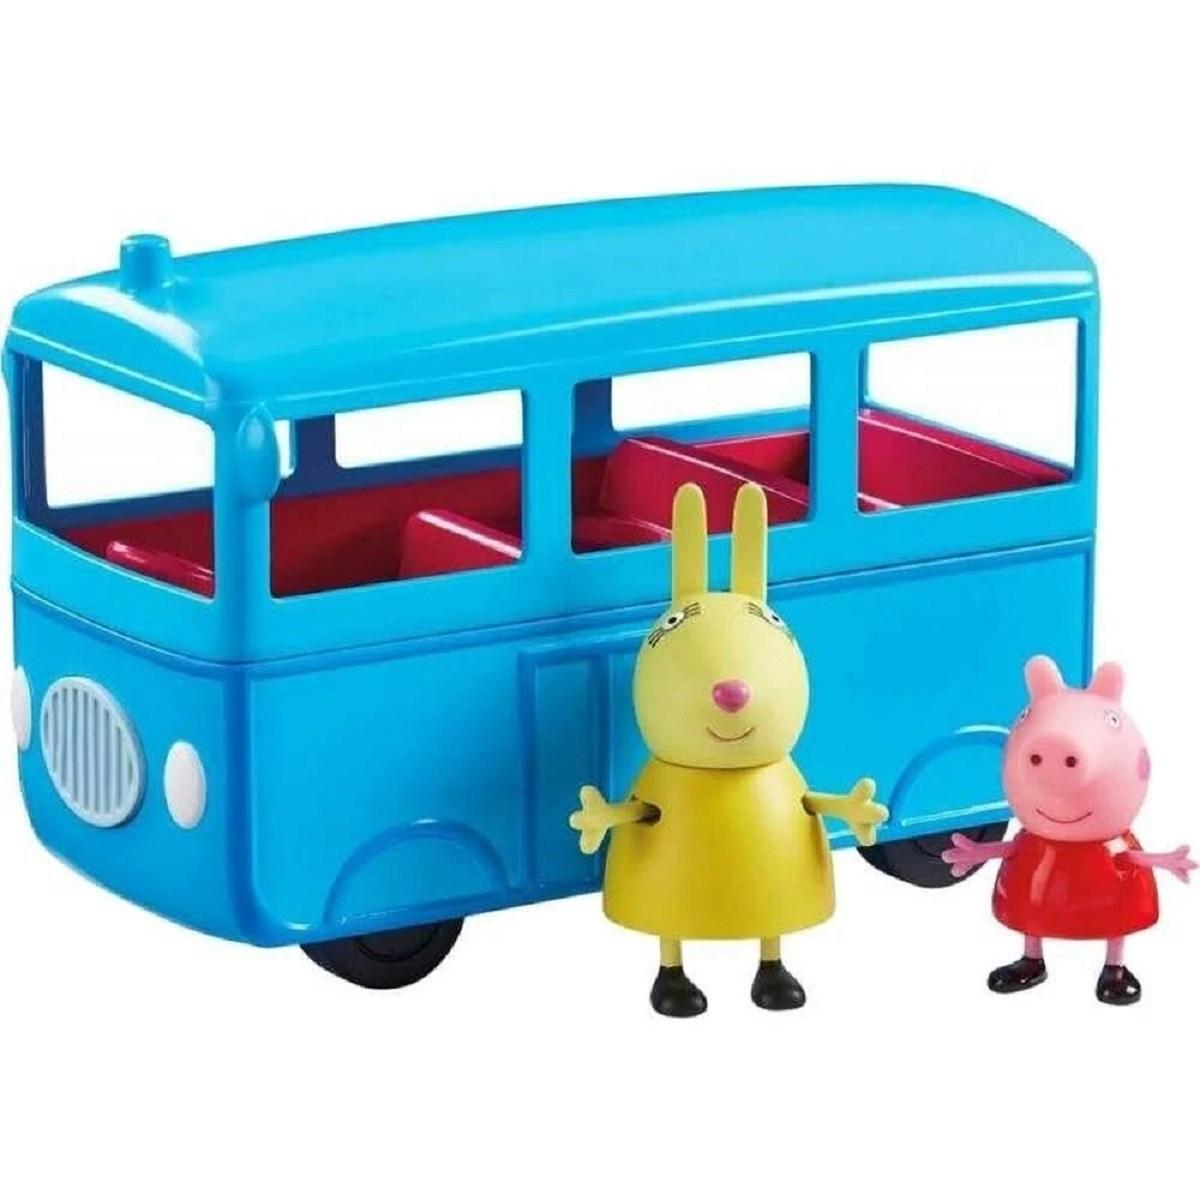 Brinquedo Infantil ÔNIBUS ESCOLAR DA PEPPA SUNNY 2305